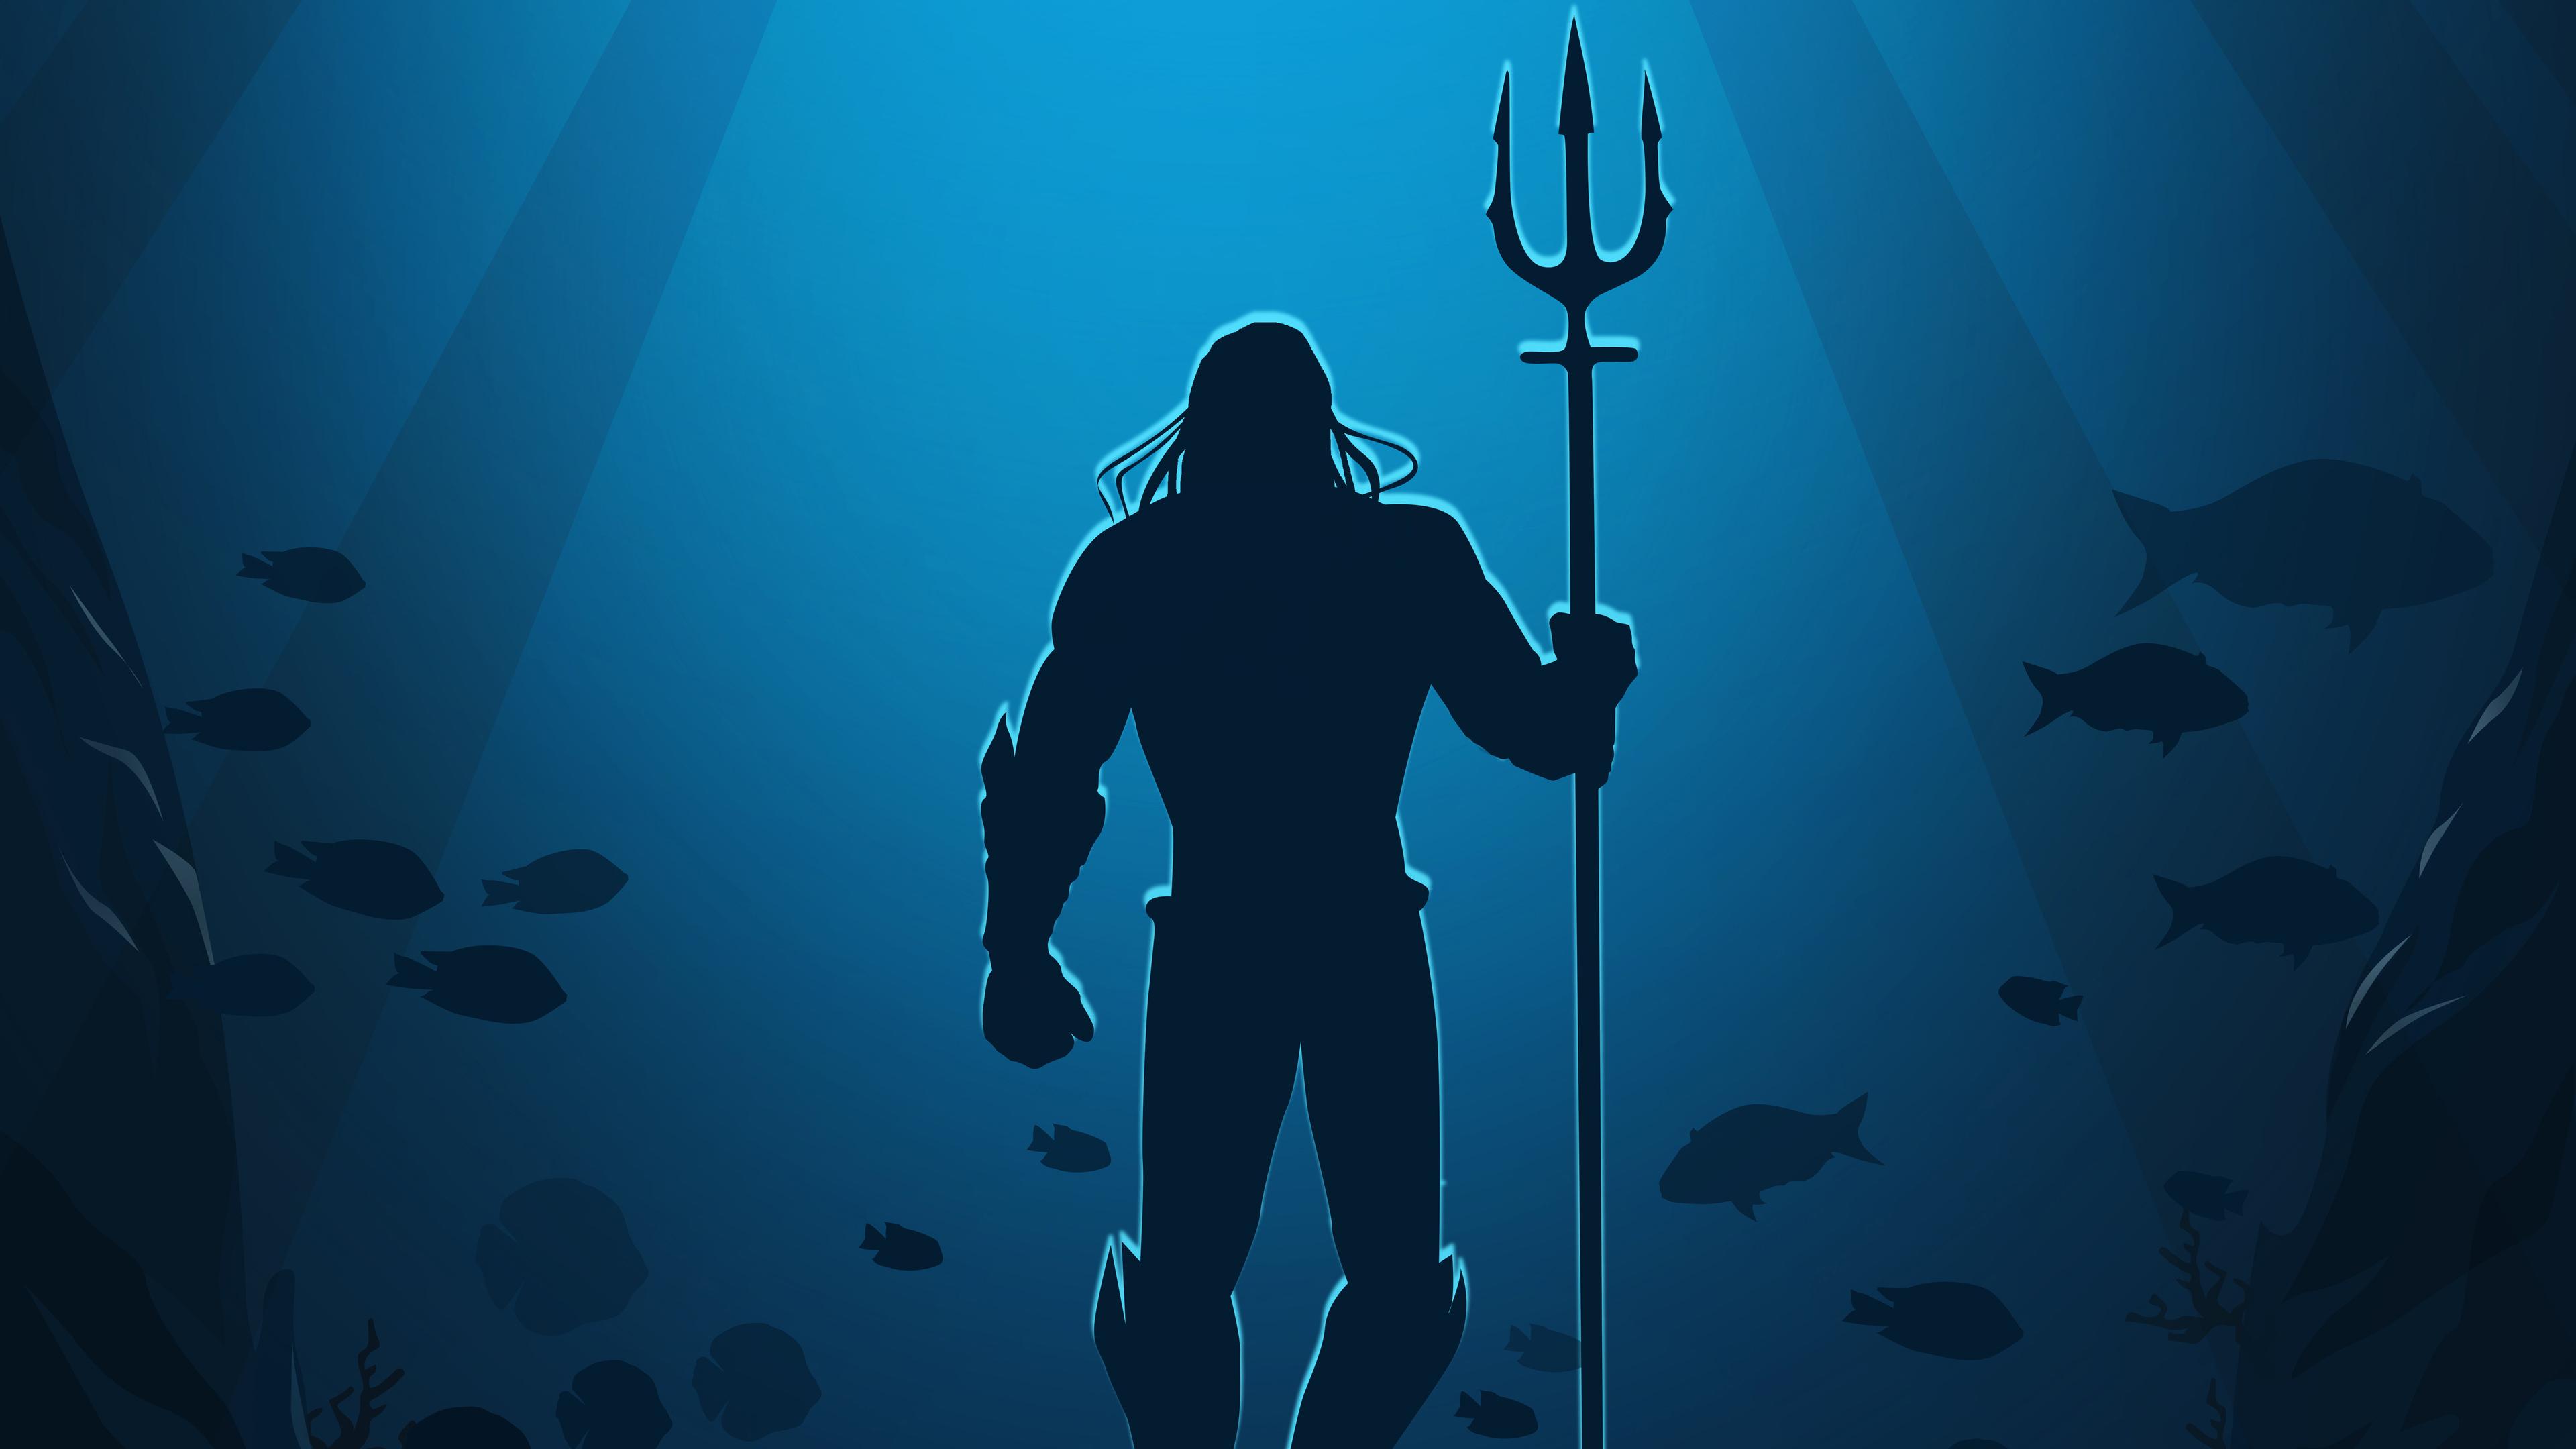 aquaman movie poster art 4k 1553072191 - Aquaman Movie Poster Art 4k - superheroes wallpapers, hd-wallpapers, digital art wallpapers, artwork wallpapers, aquaman wallpapers, 5k wallpapers, 4k-wallpapers